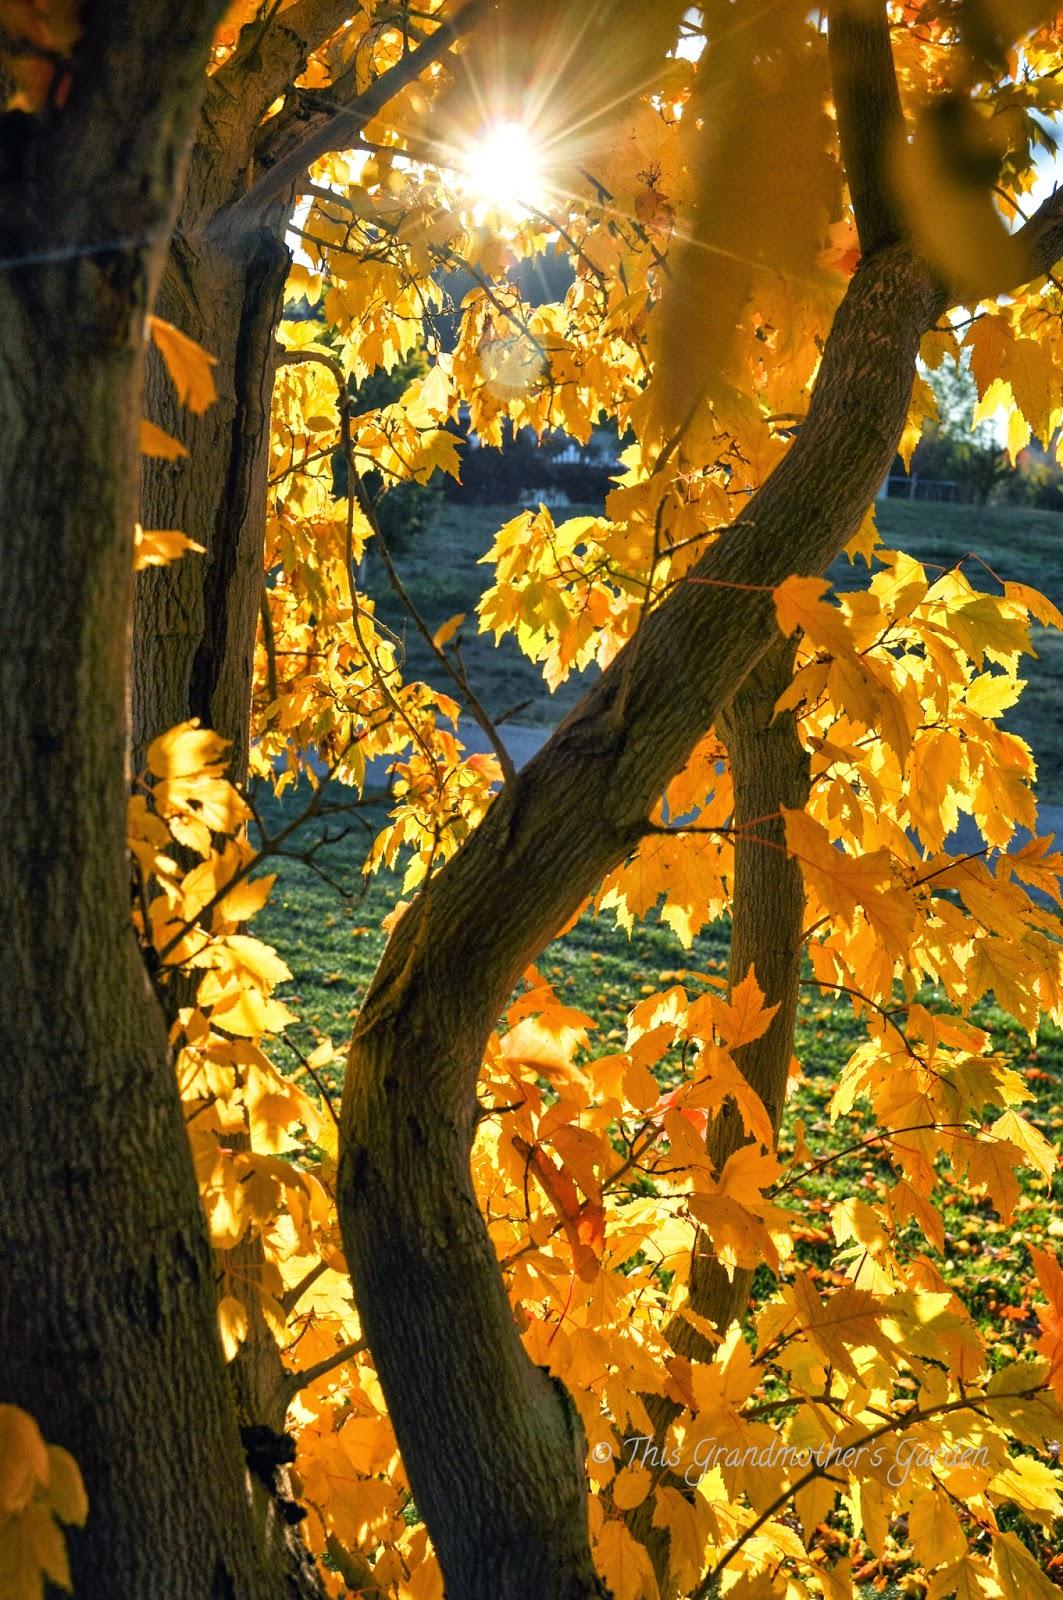 this grandmother u0026 39 s garden  capturing autumn u0026 39 s golden light